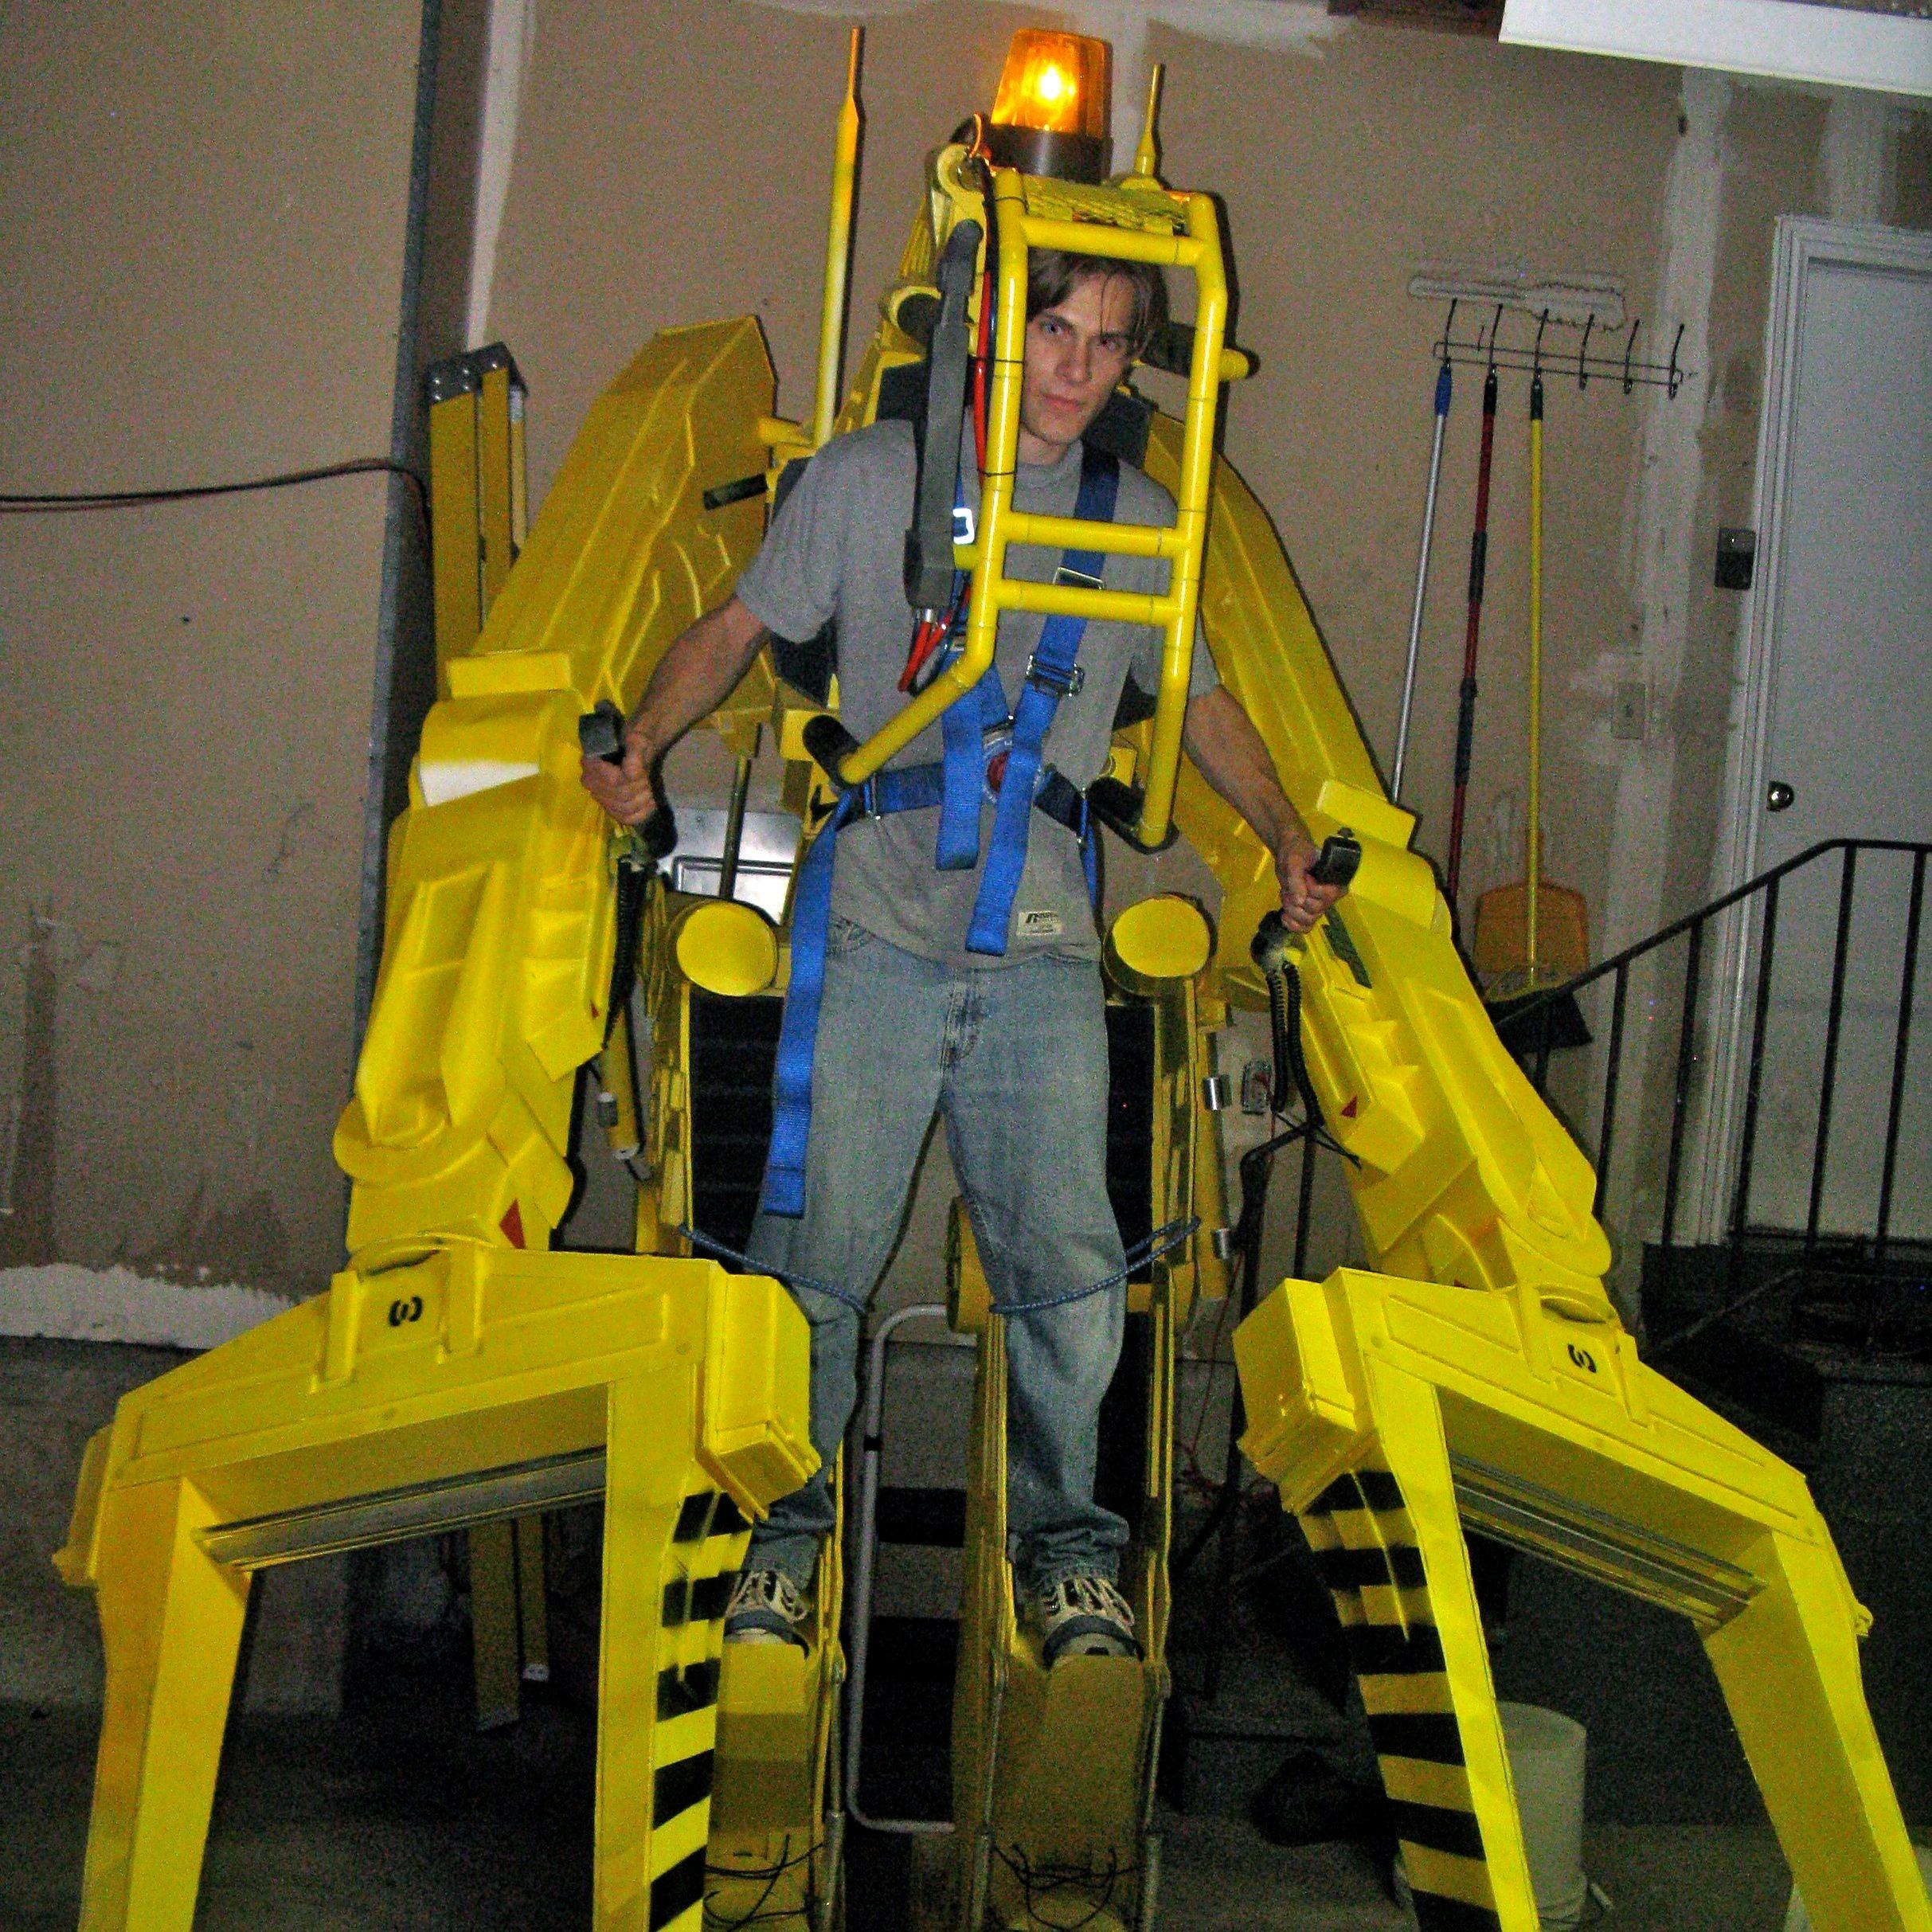 Costume Halloween Robot.Robot Costumes Instructables